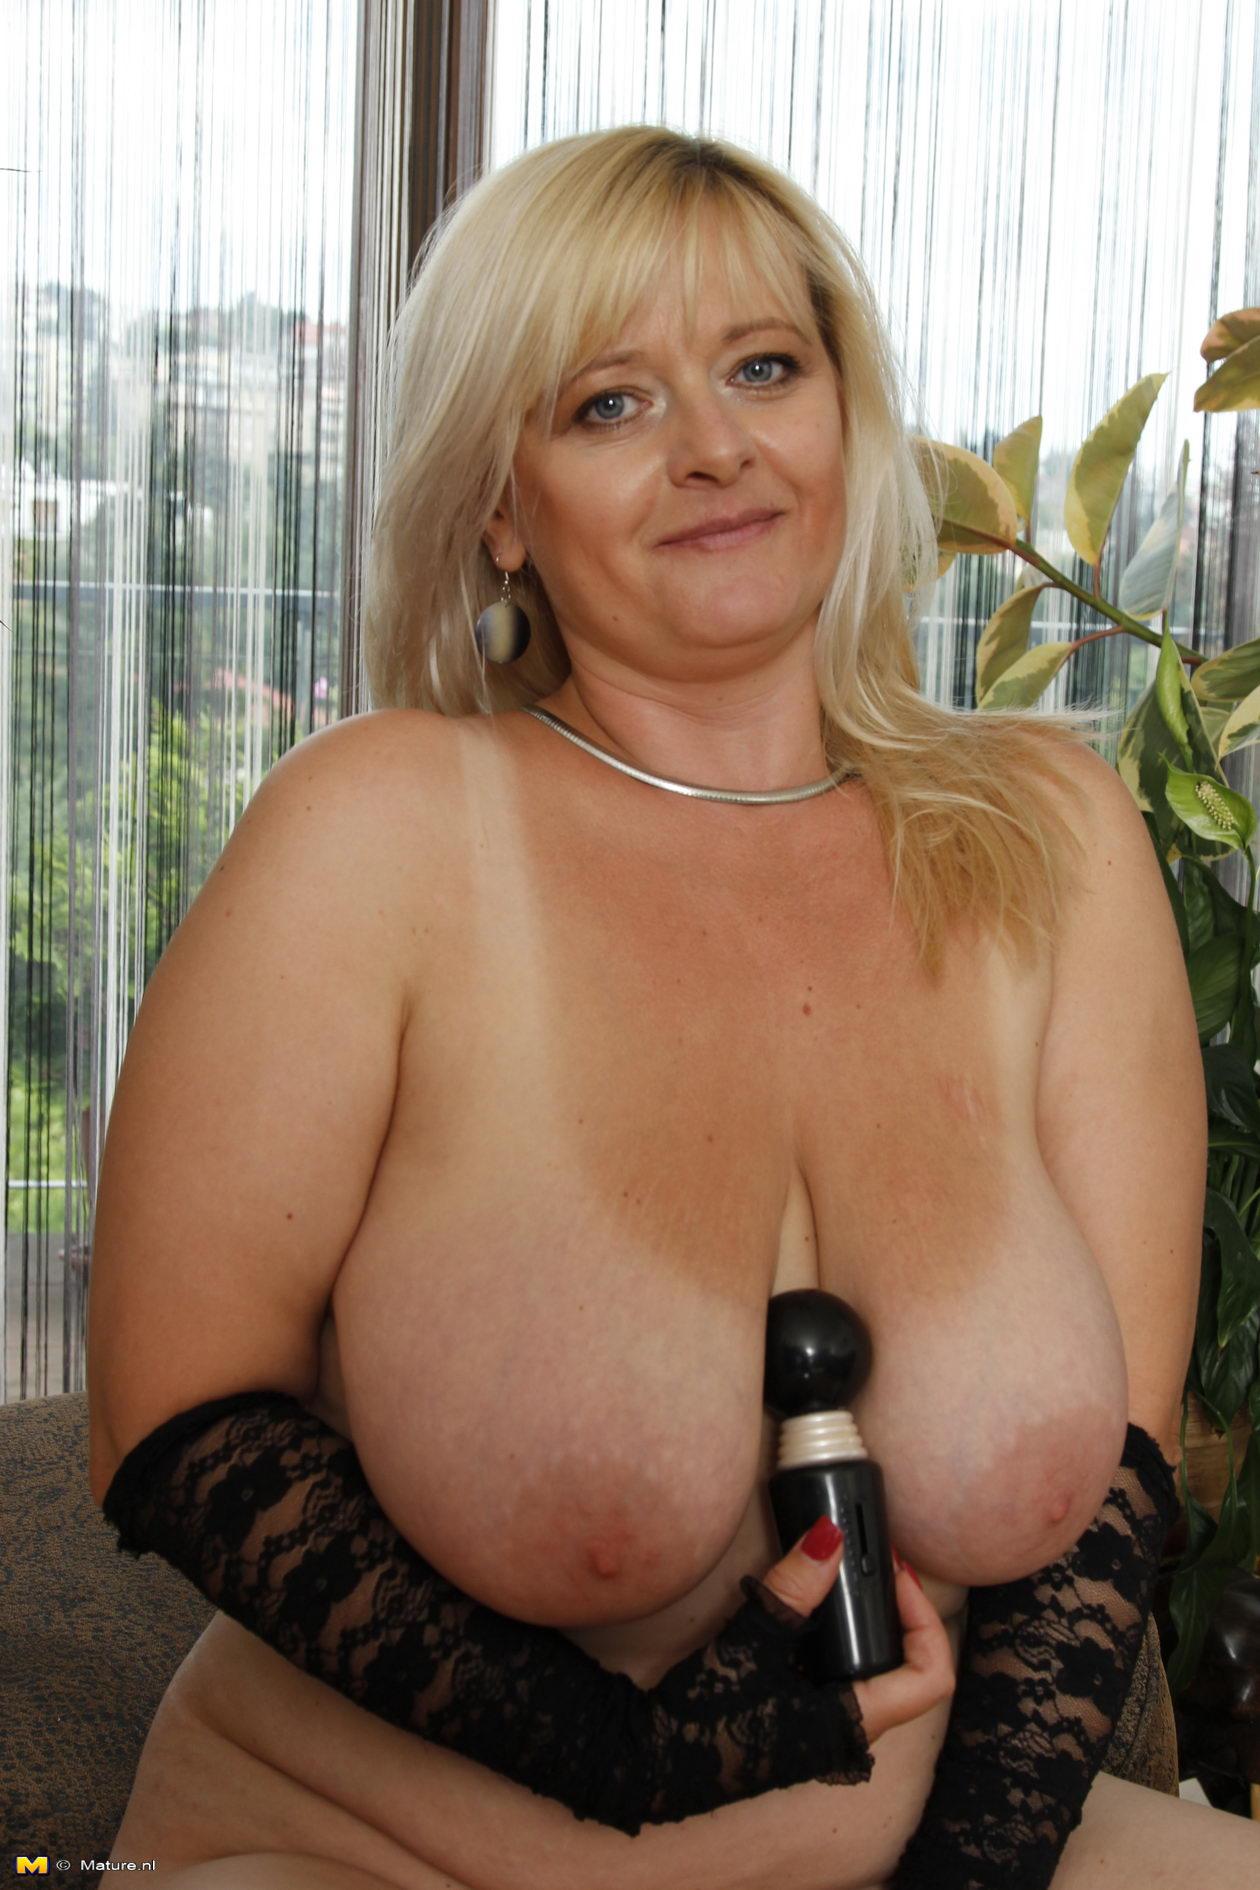 Big Huge Breasted Nude Women Getting Fuck